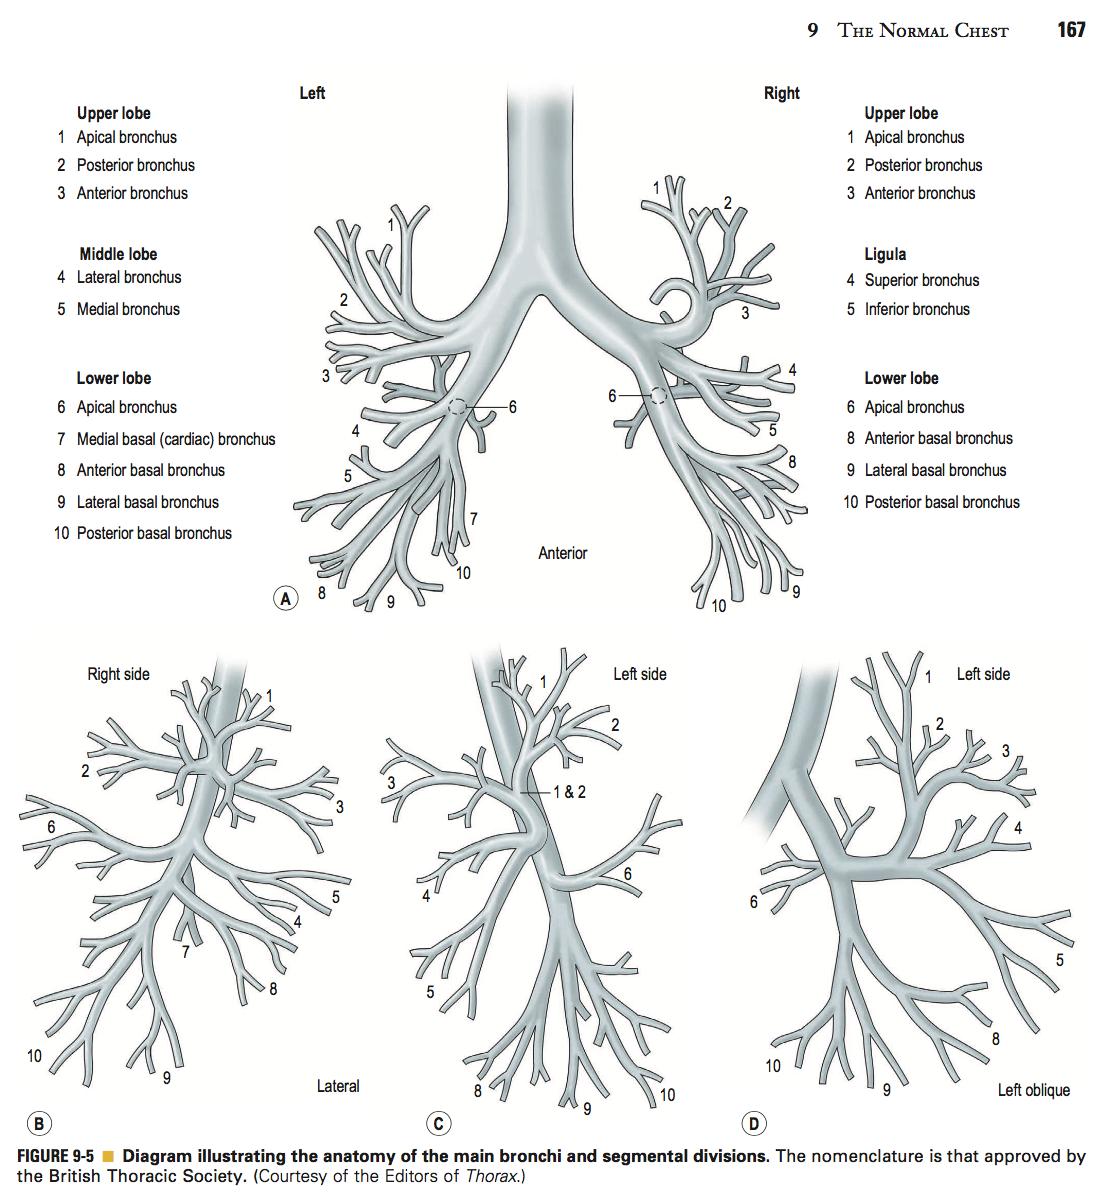 Anatomy of bronchopulmonary segments | ANATOMICA RADIOLOGICA